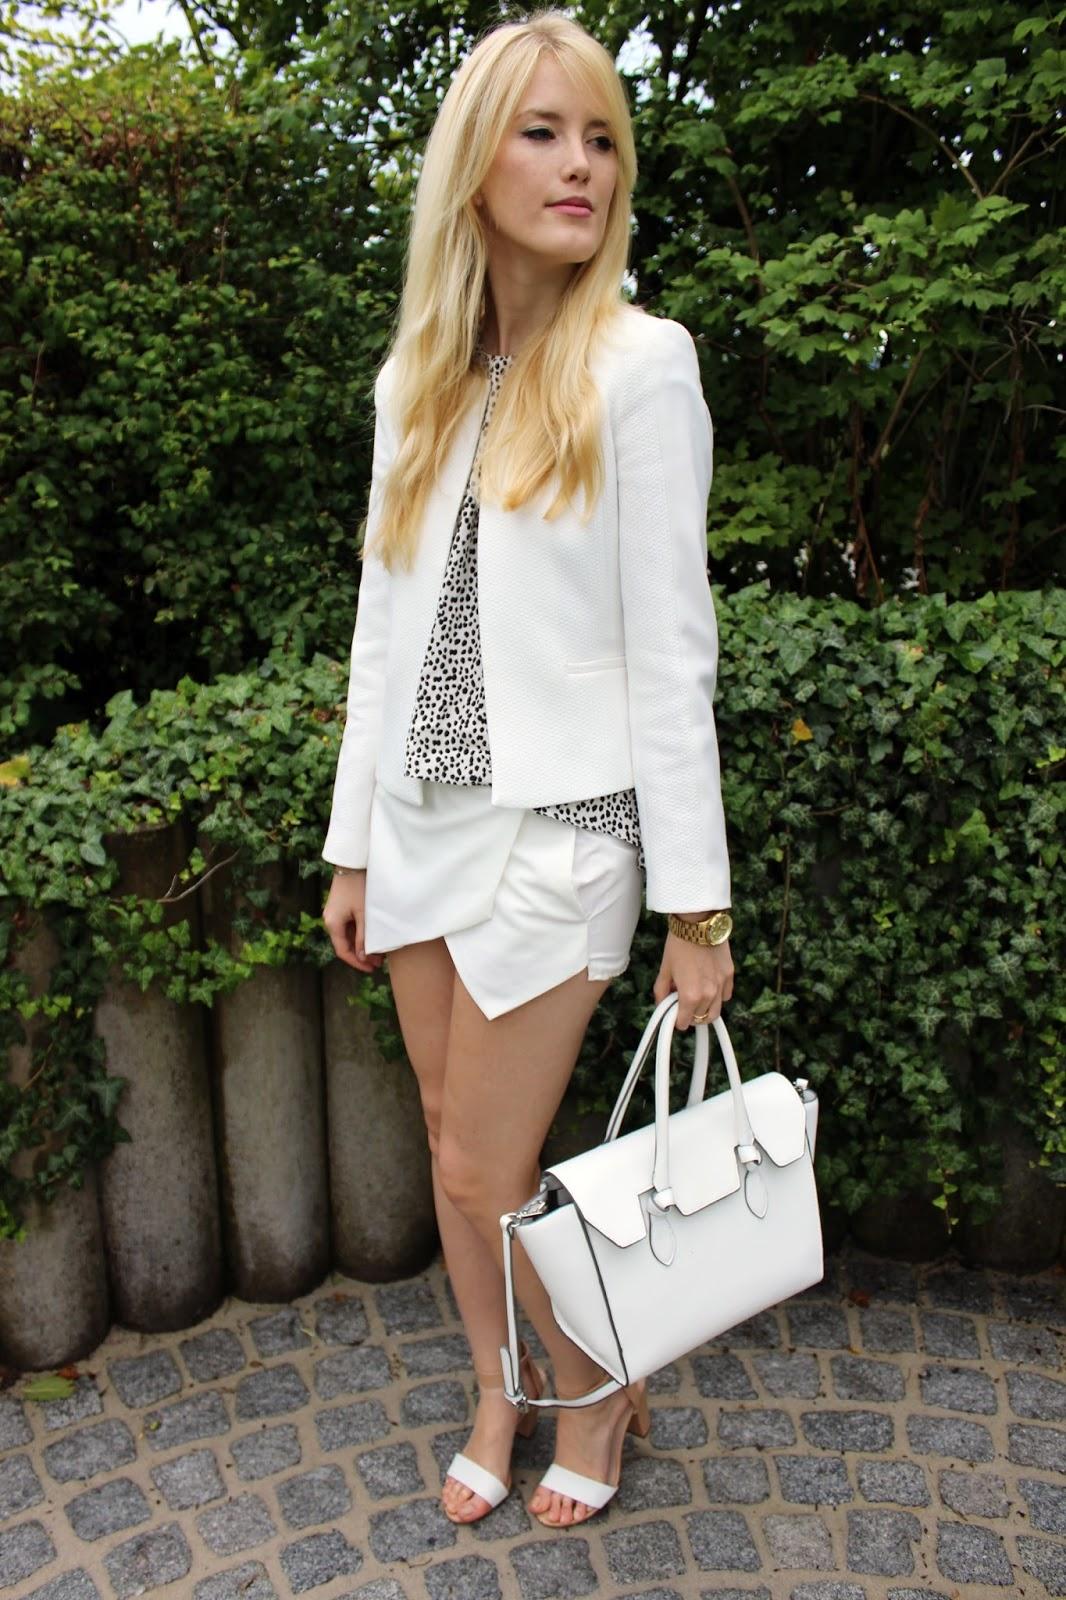 How to style White Allwhite TheBlondeLion Zara Skorts Blazer